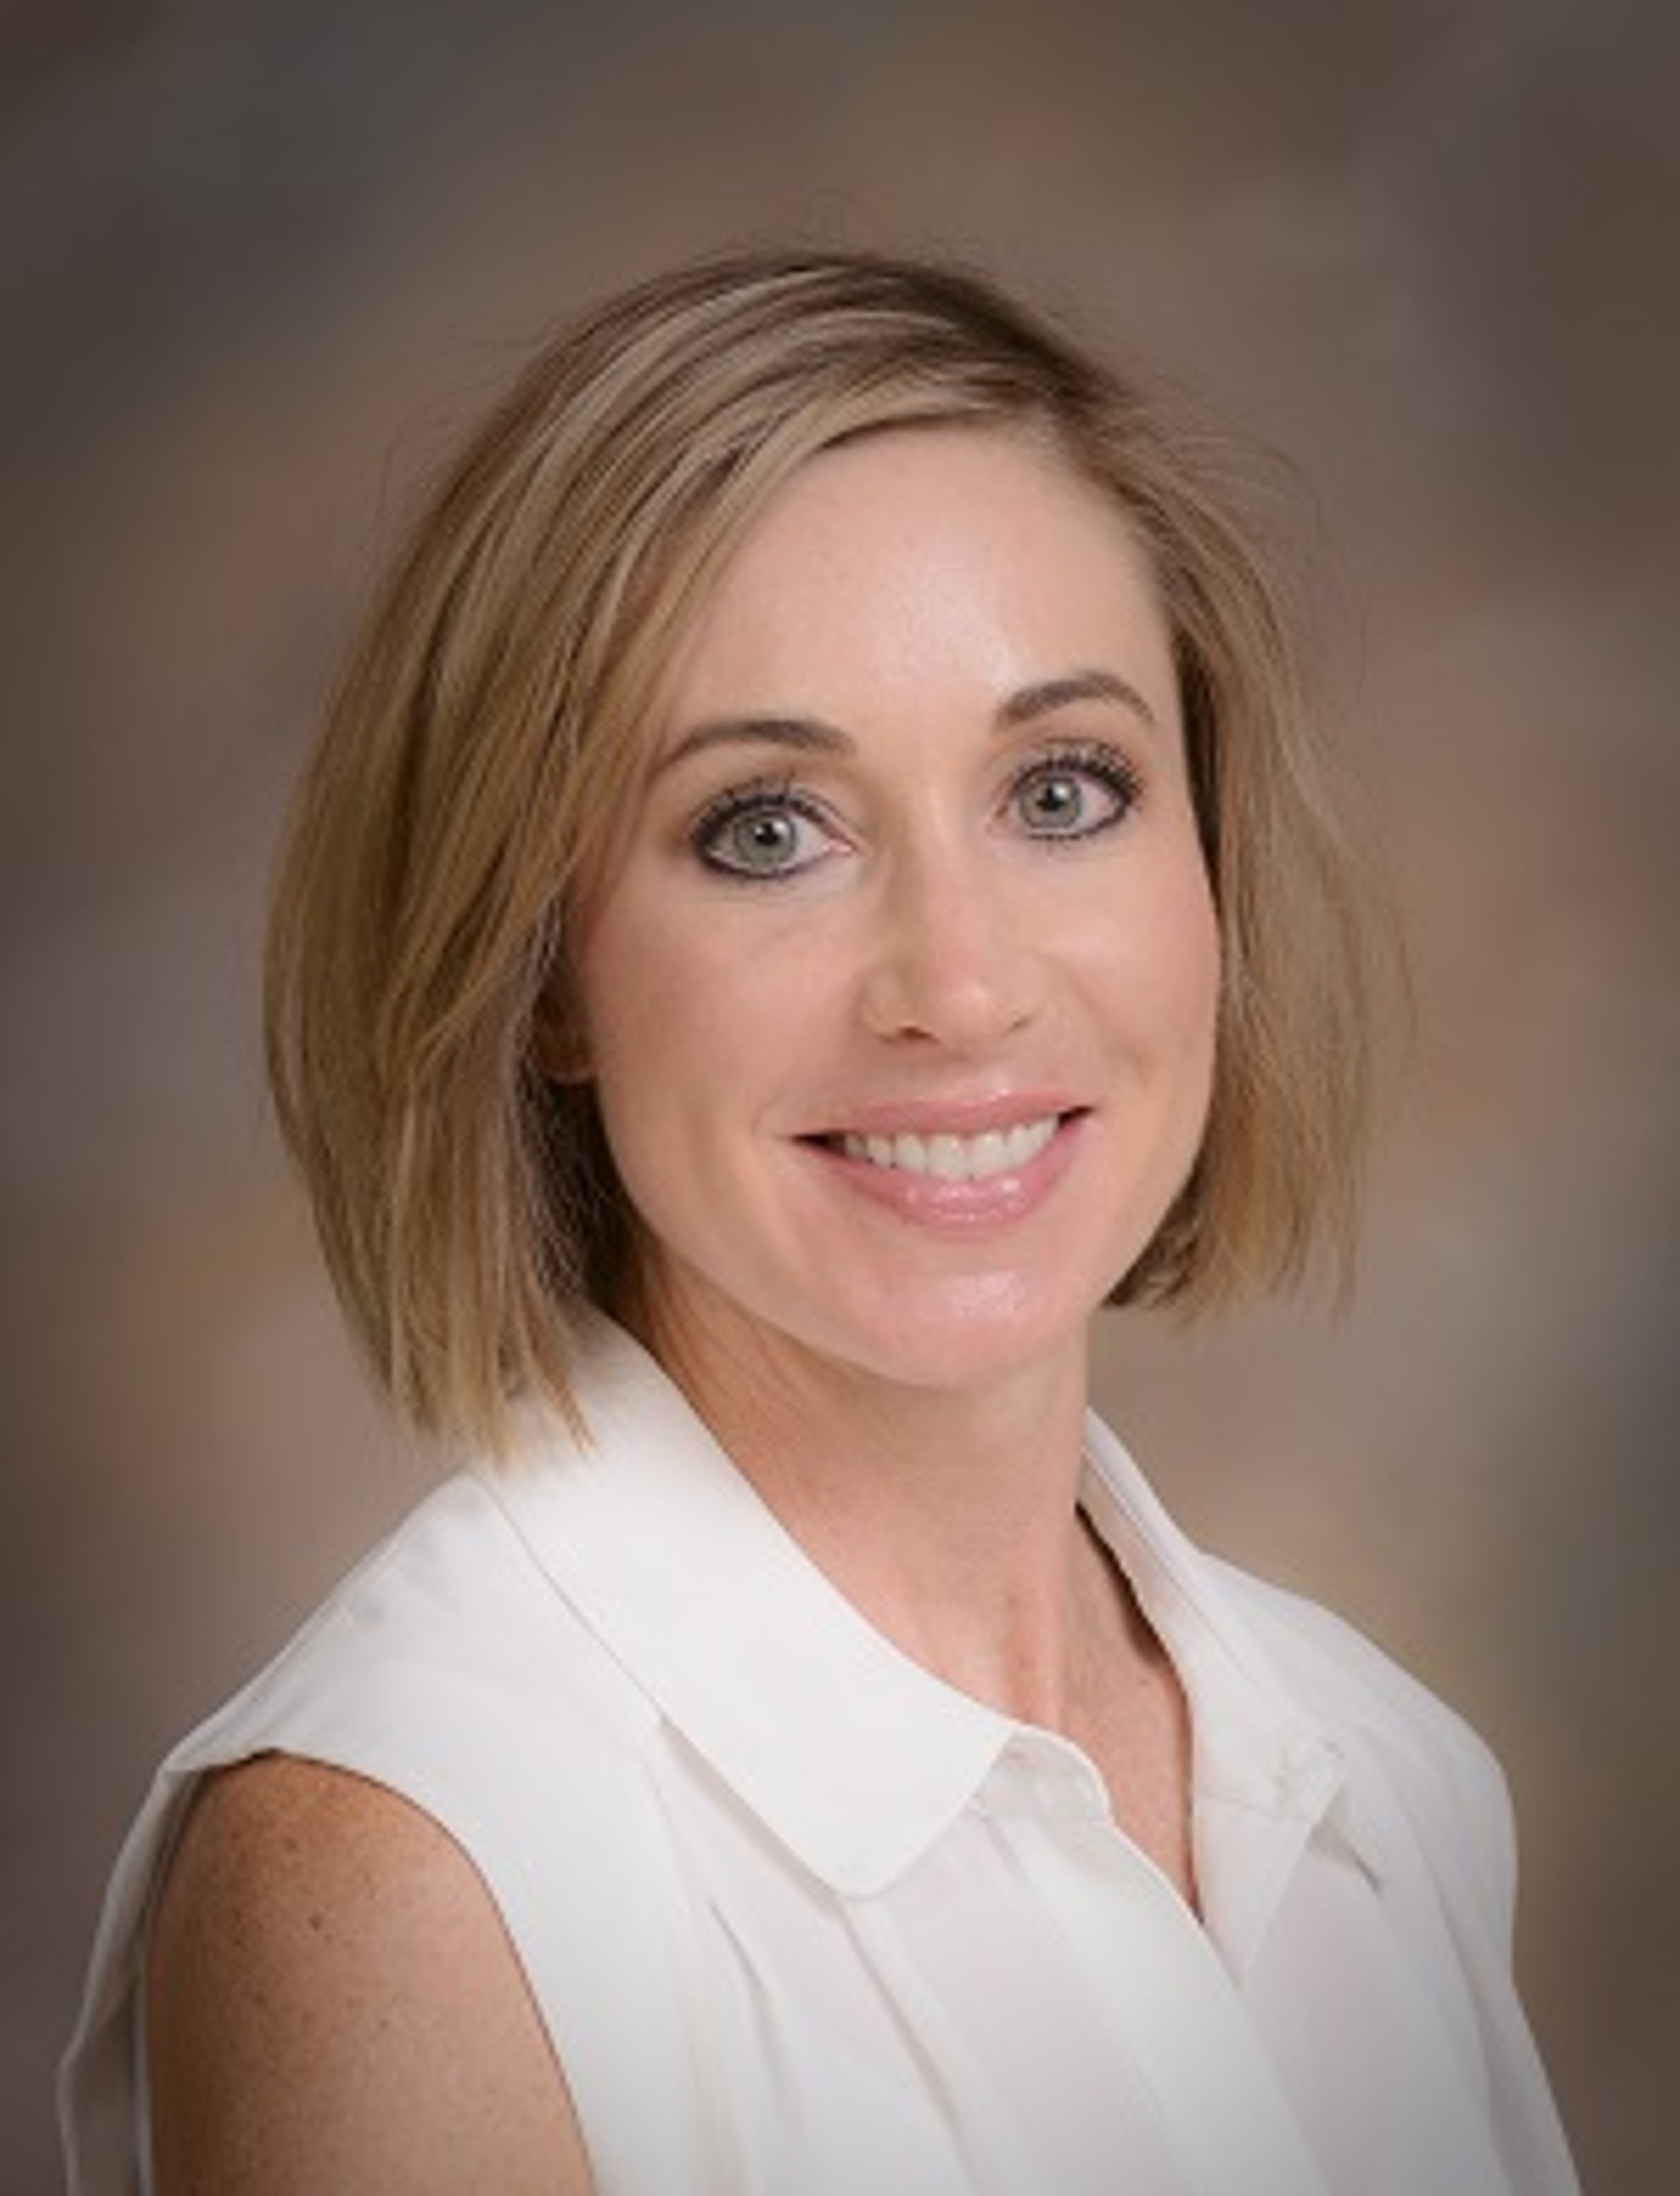 Mindy A Patterson, Ph.D., RDN